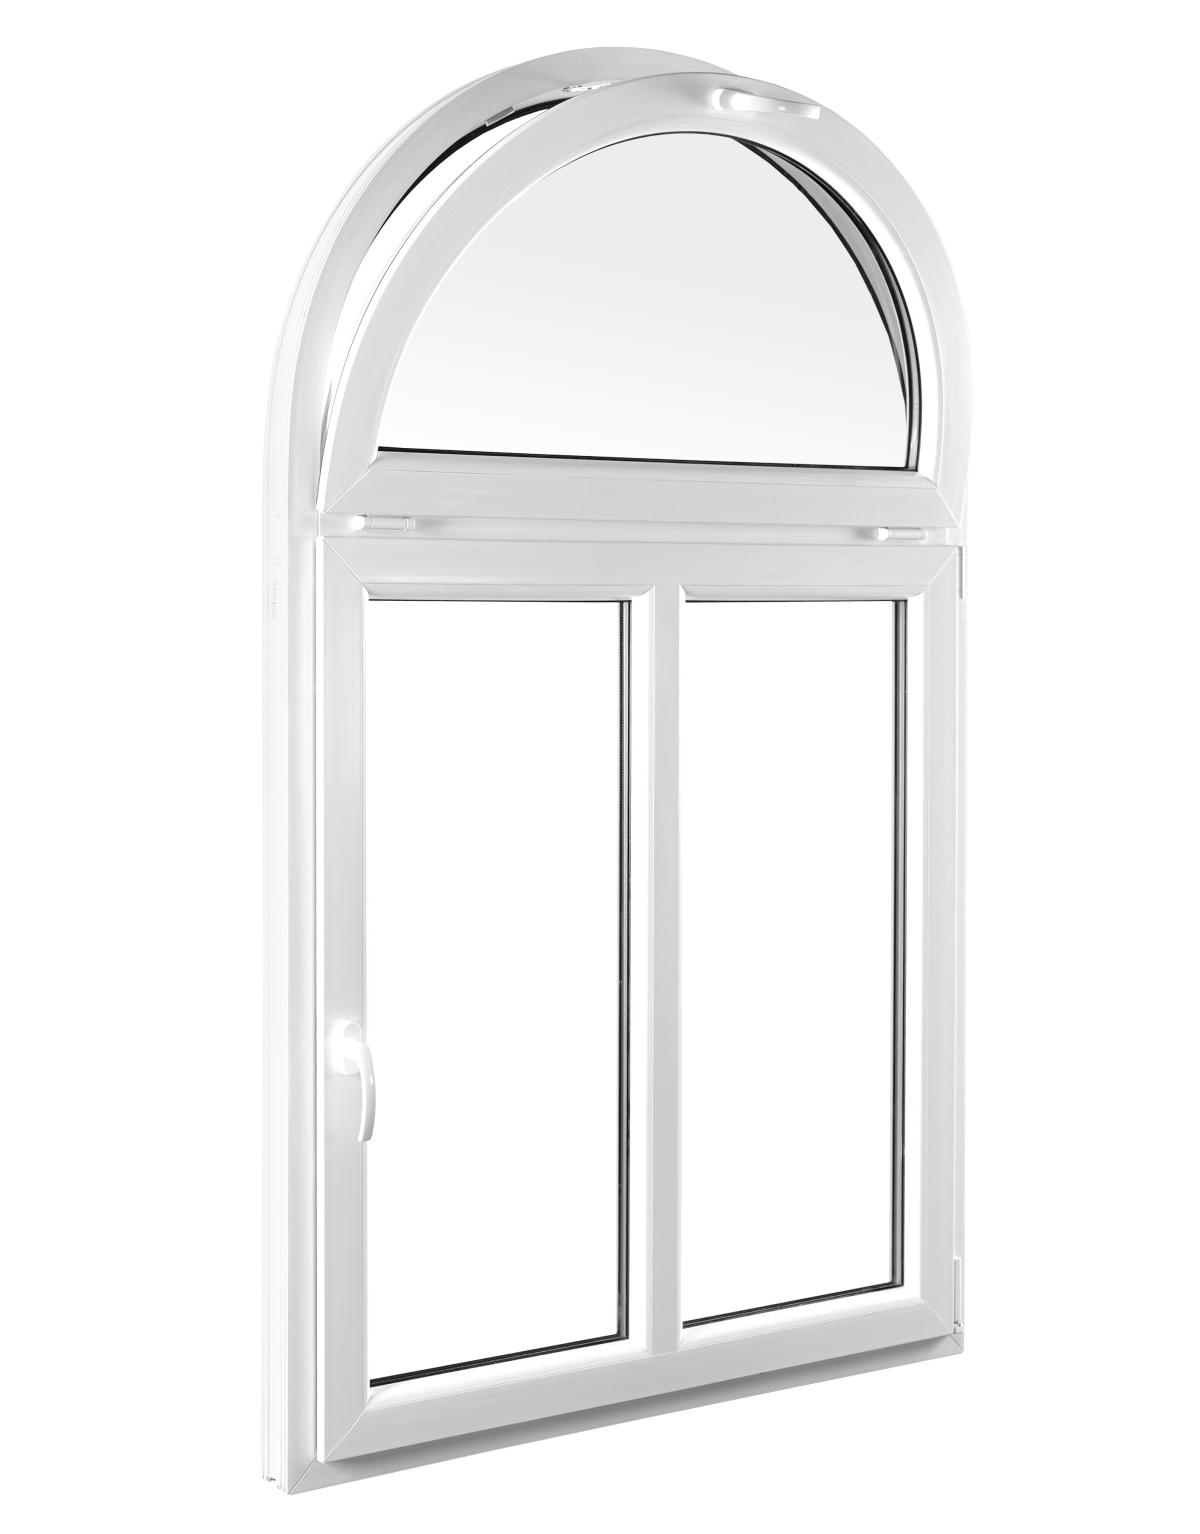 Full Size of Holz Alu Fenster Preise Pro M2 Aluminium Preis Leistung Unilux Preisliste Preisunterschied Erfahrungen Kosten Qm Preisvergleich Online Holz Alu Pvc Günstig Fenster Holz Alu Fenster Preise